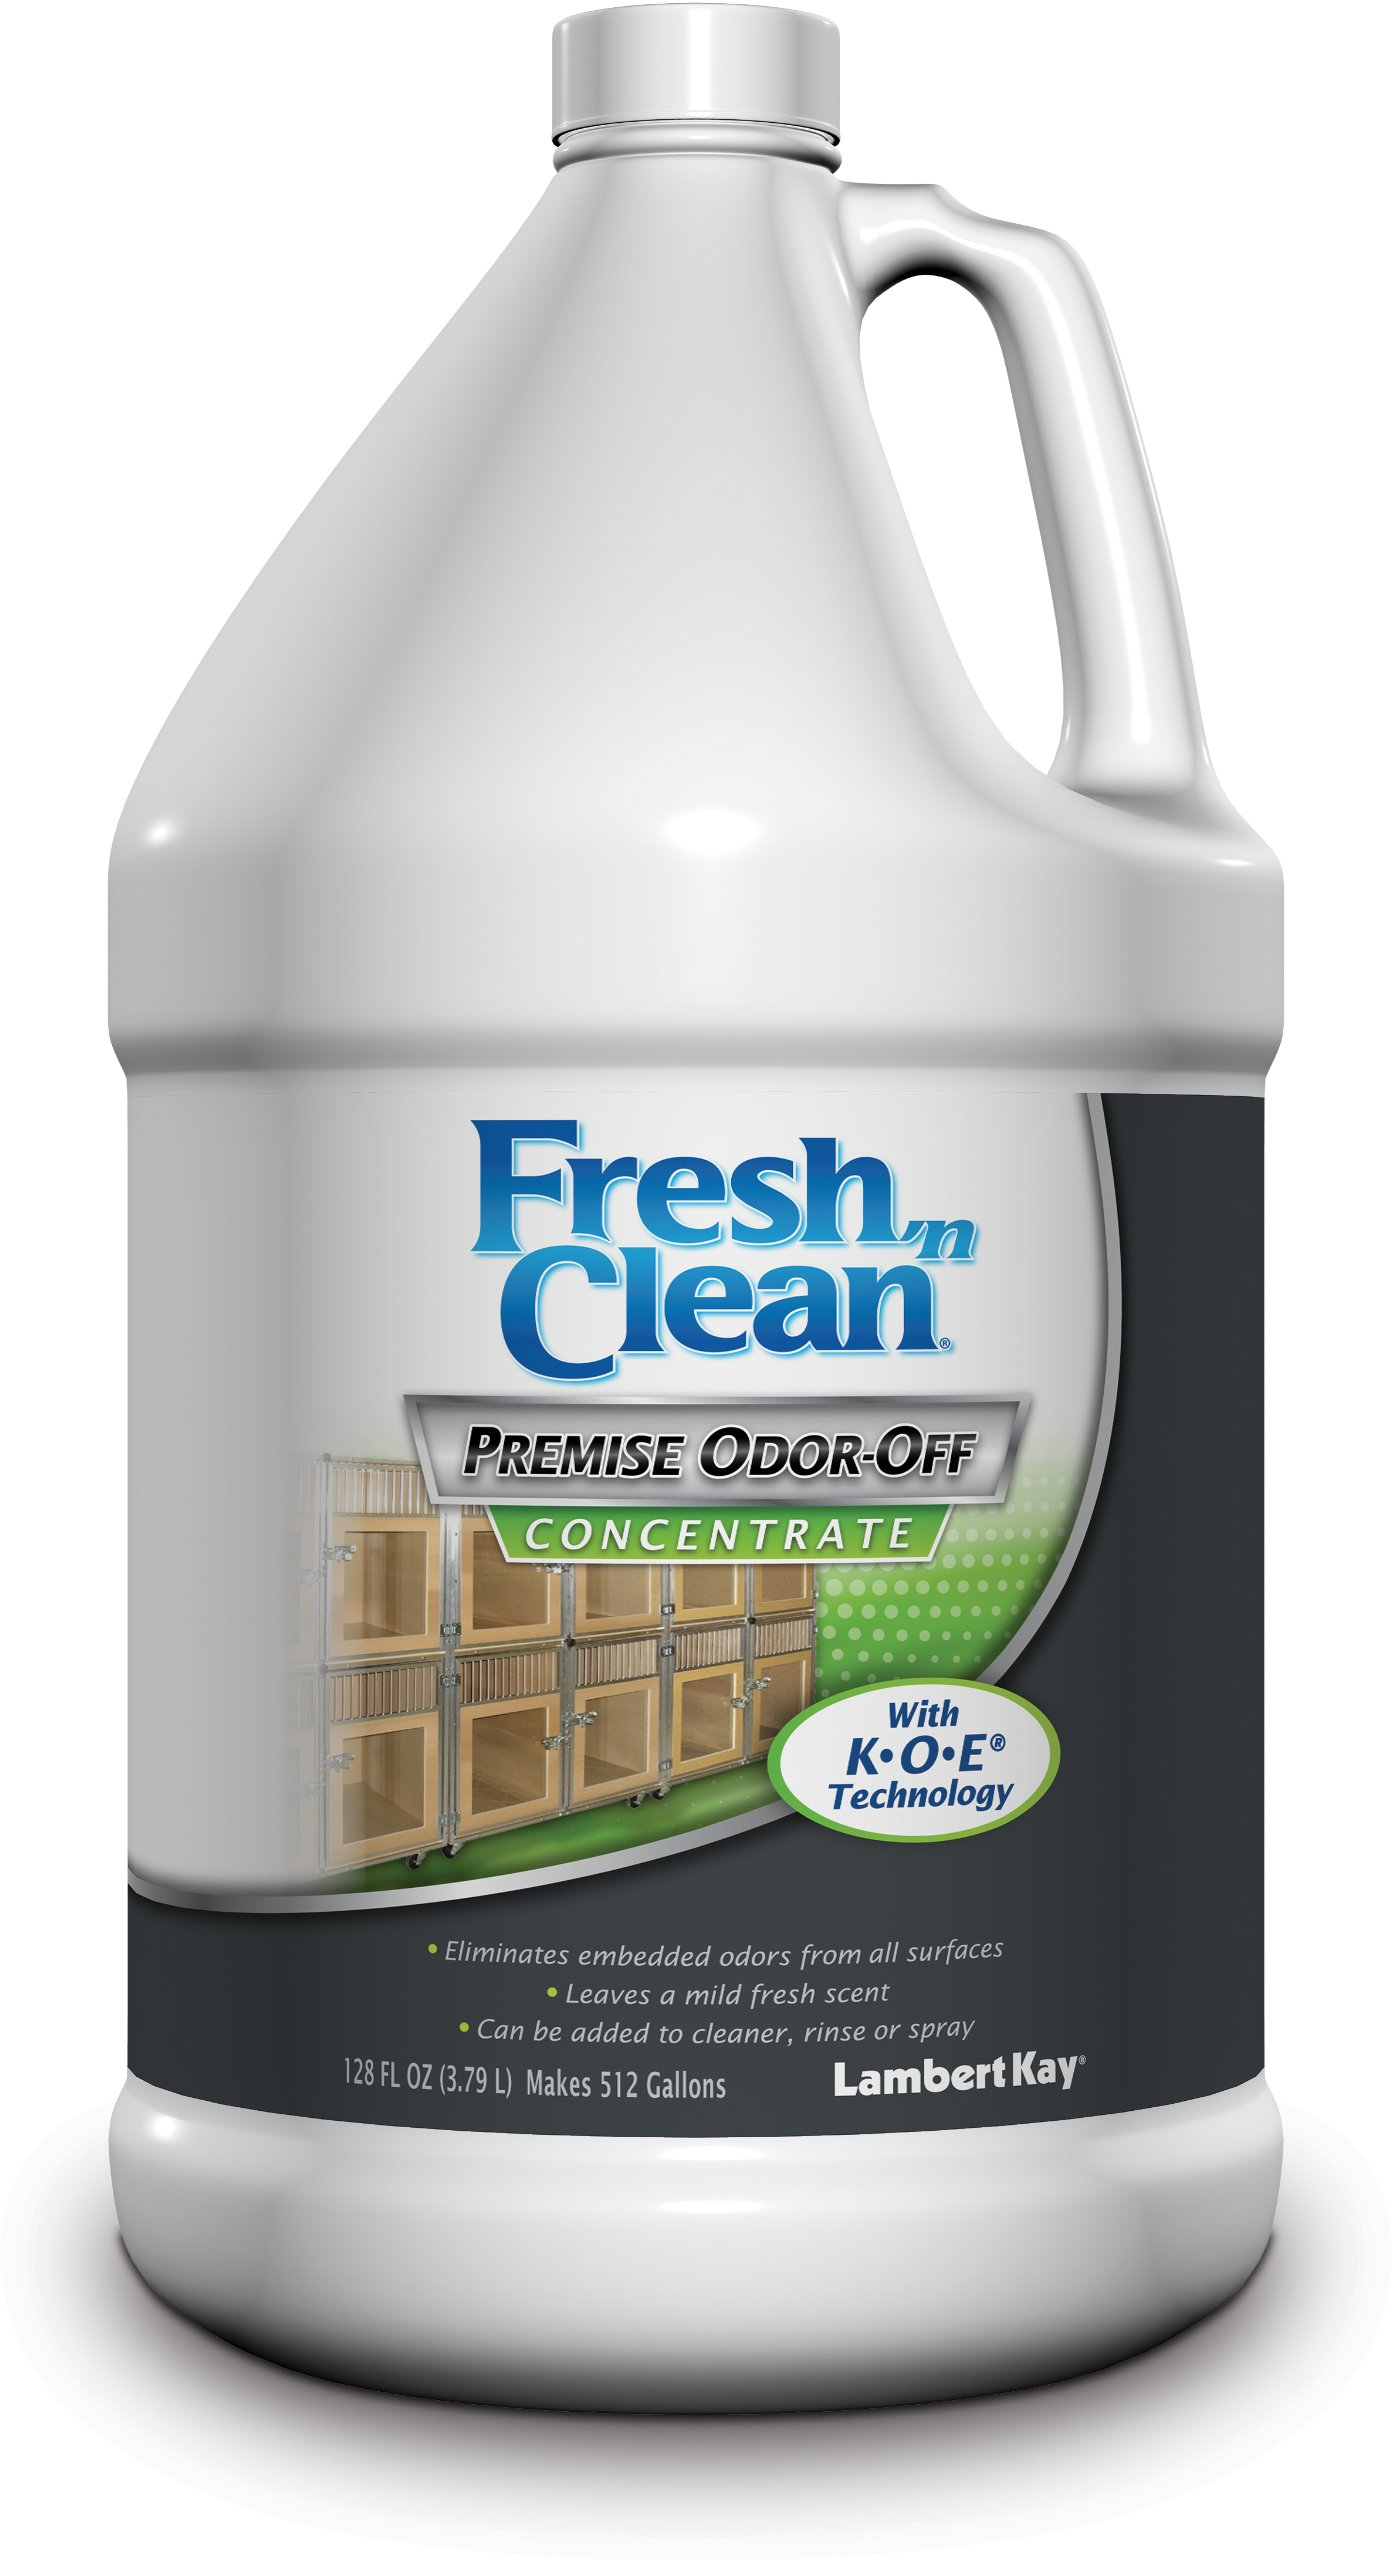 Lambert Kay Fresh 'n Clean Premise Odor Off Concentrate, 1-Gallon